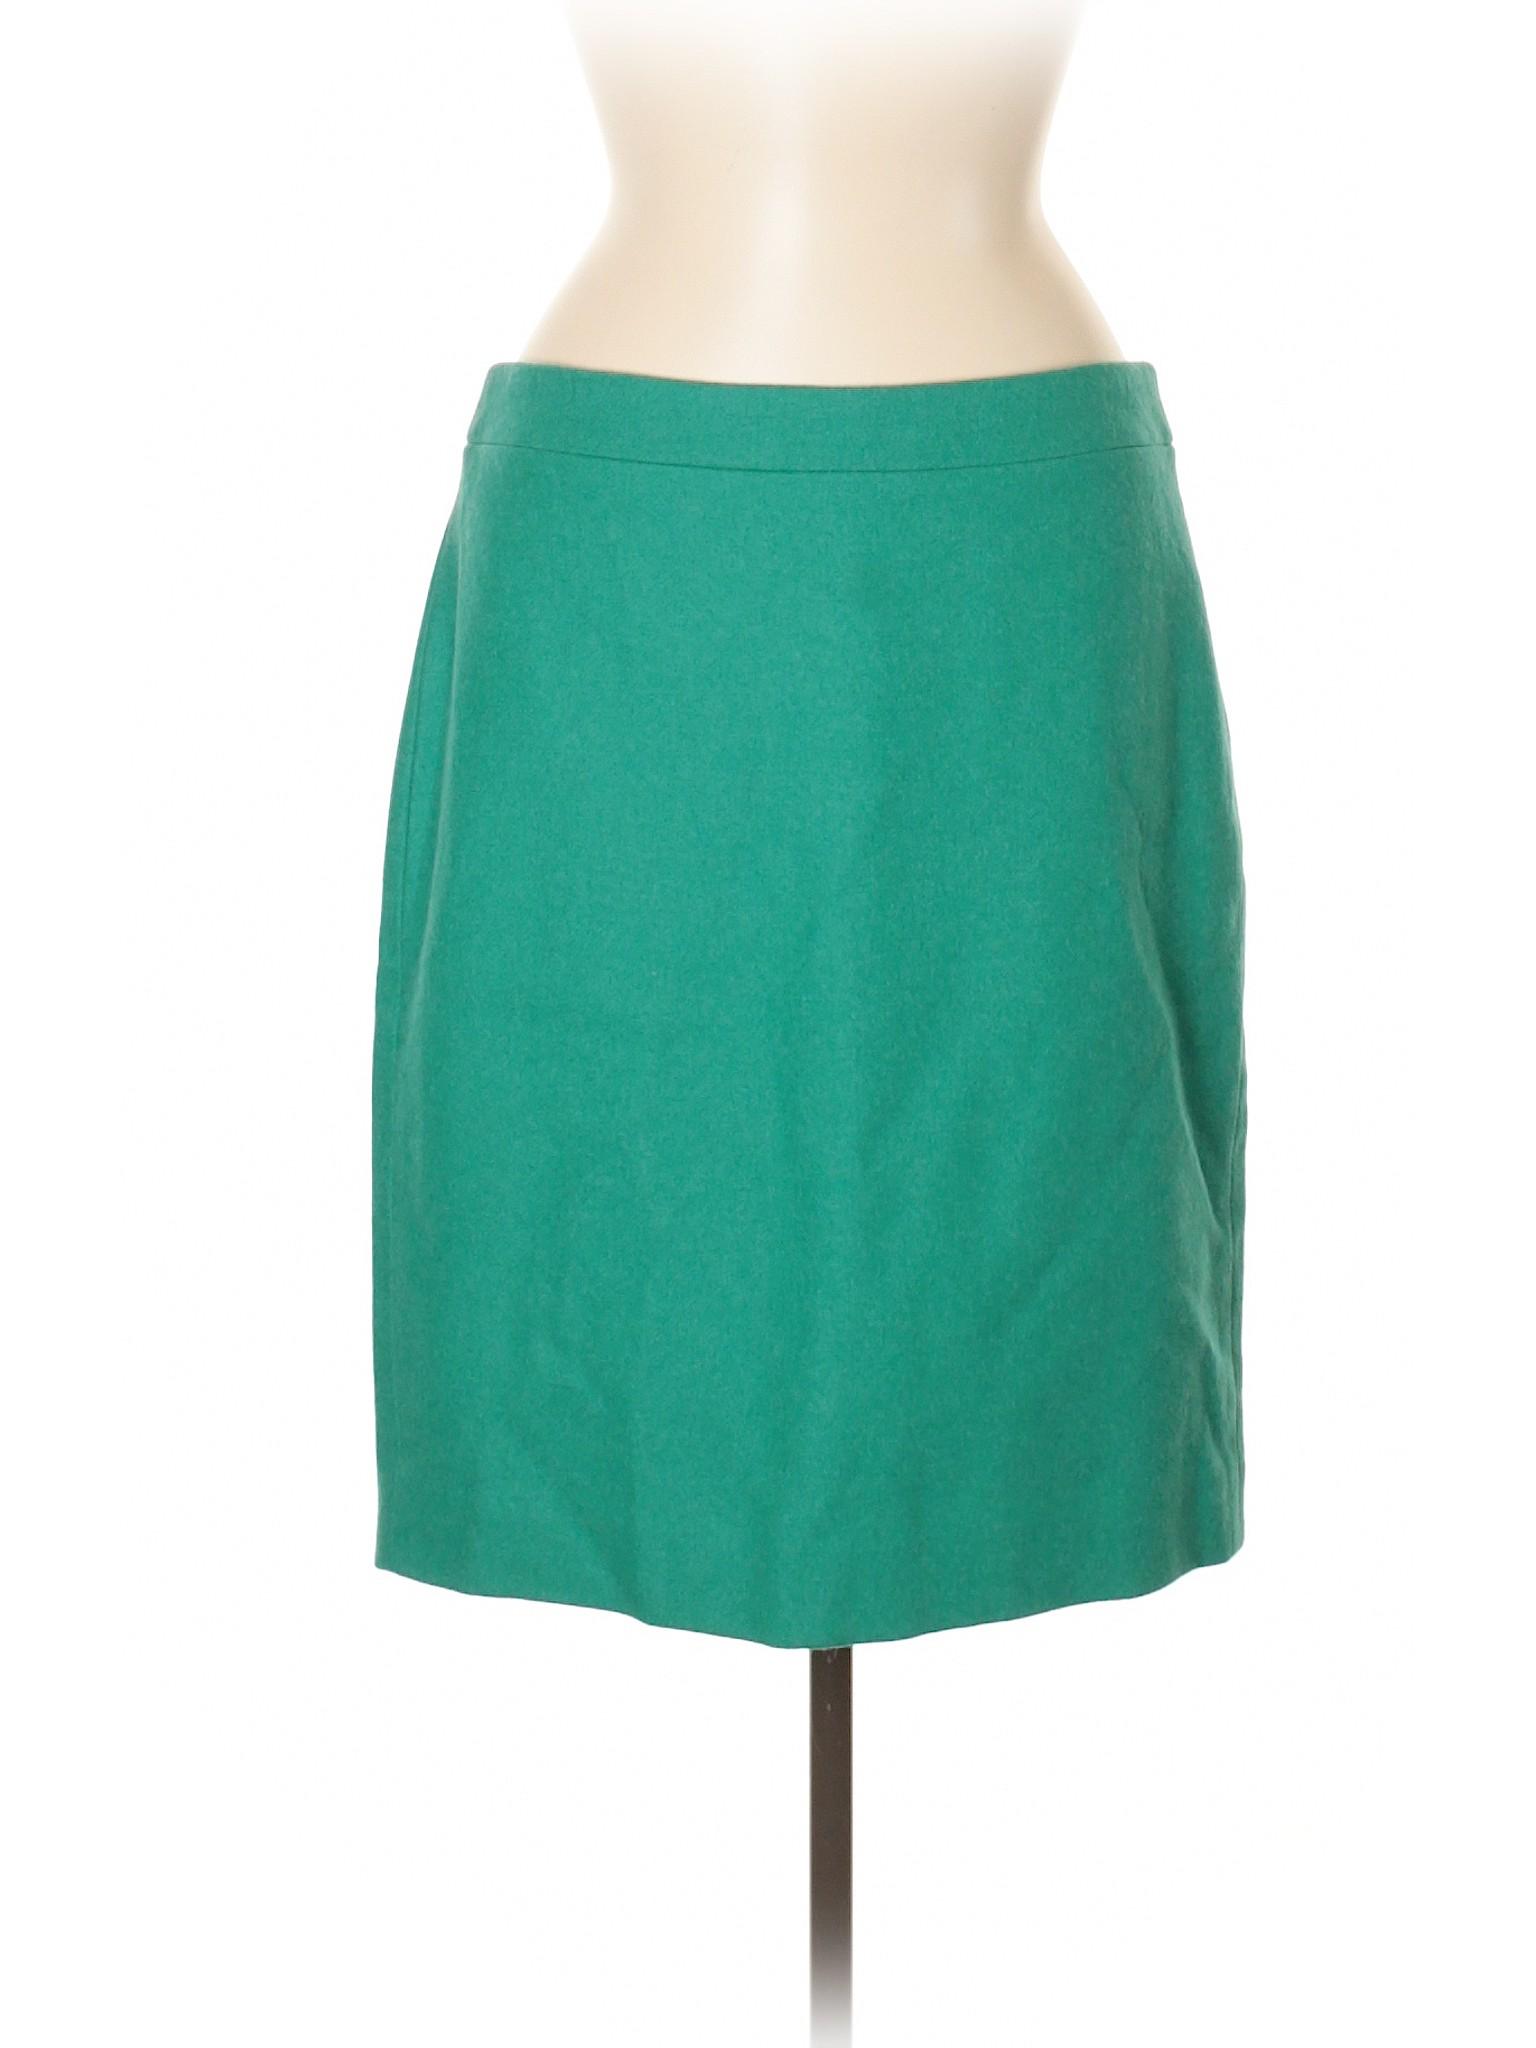 Wool Boutique Boutique Skirt Wool Wool Skirt Boutique Skirt Boutique Skirt Wool Skirt Wool Boutique vBqcxX